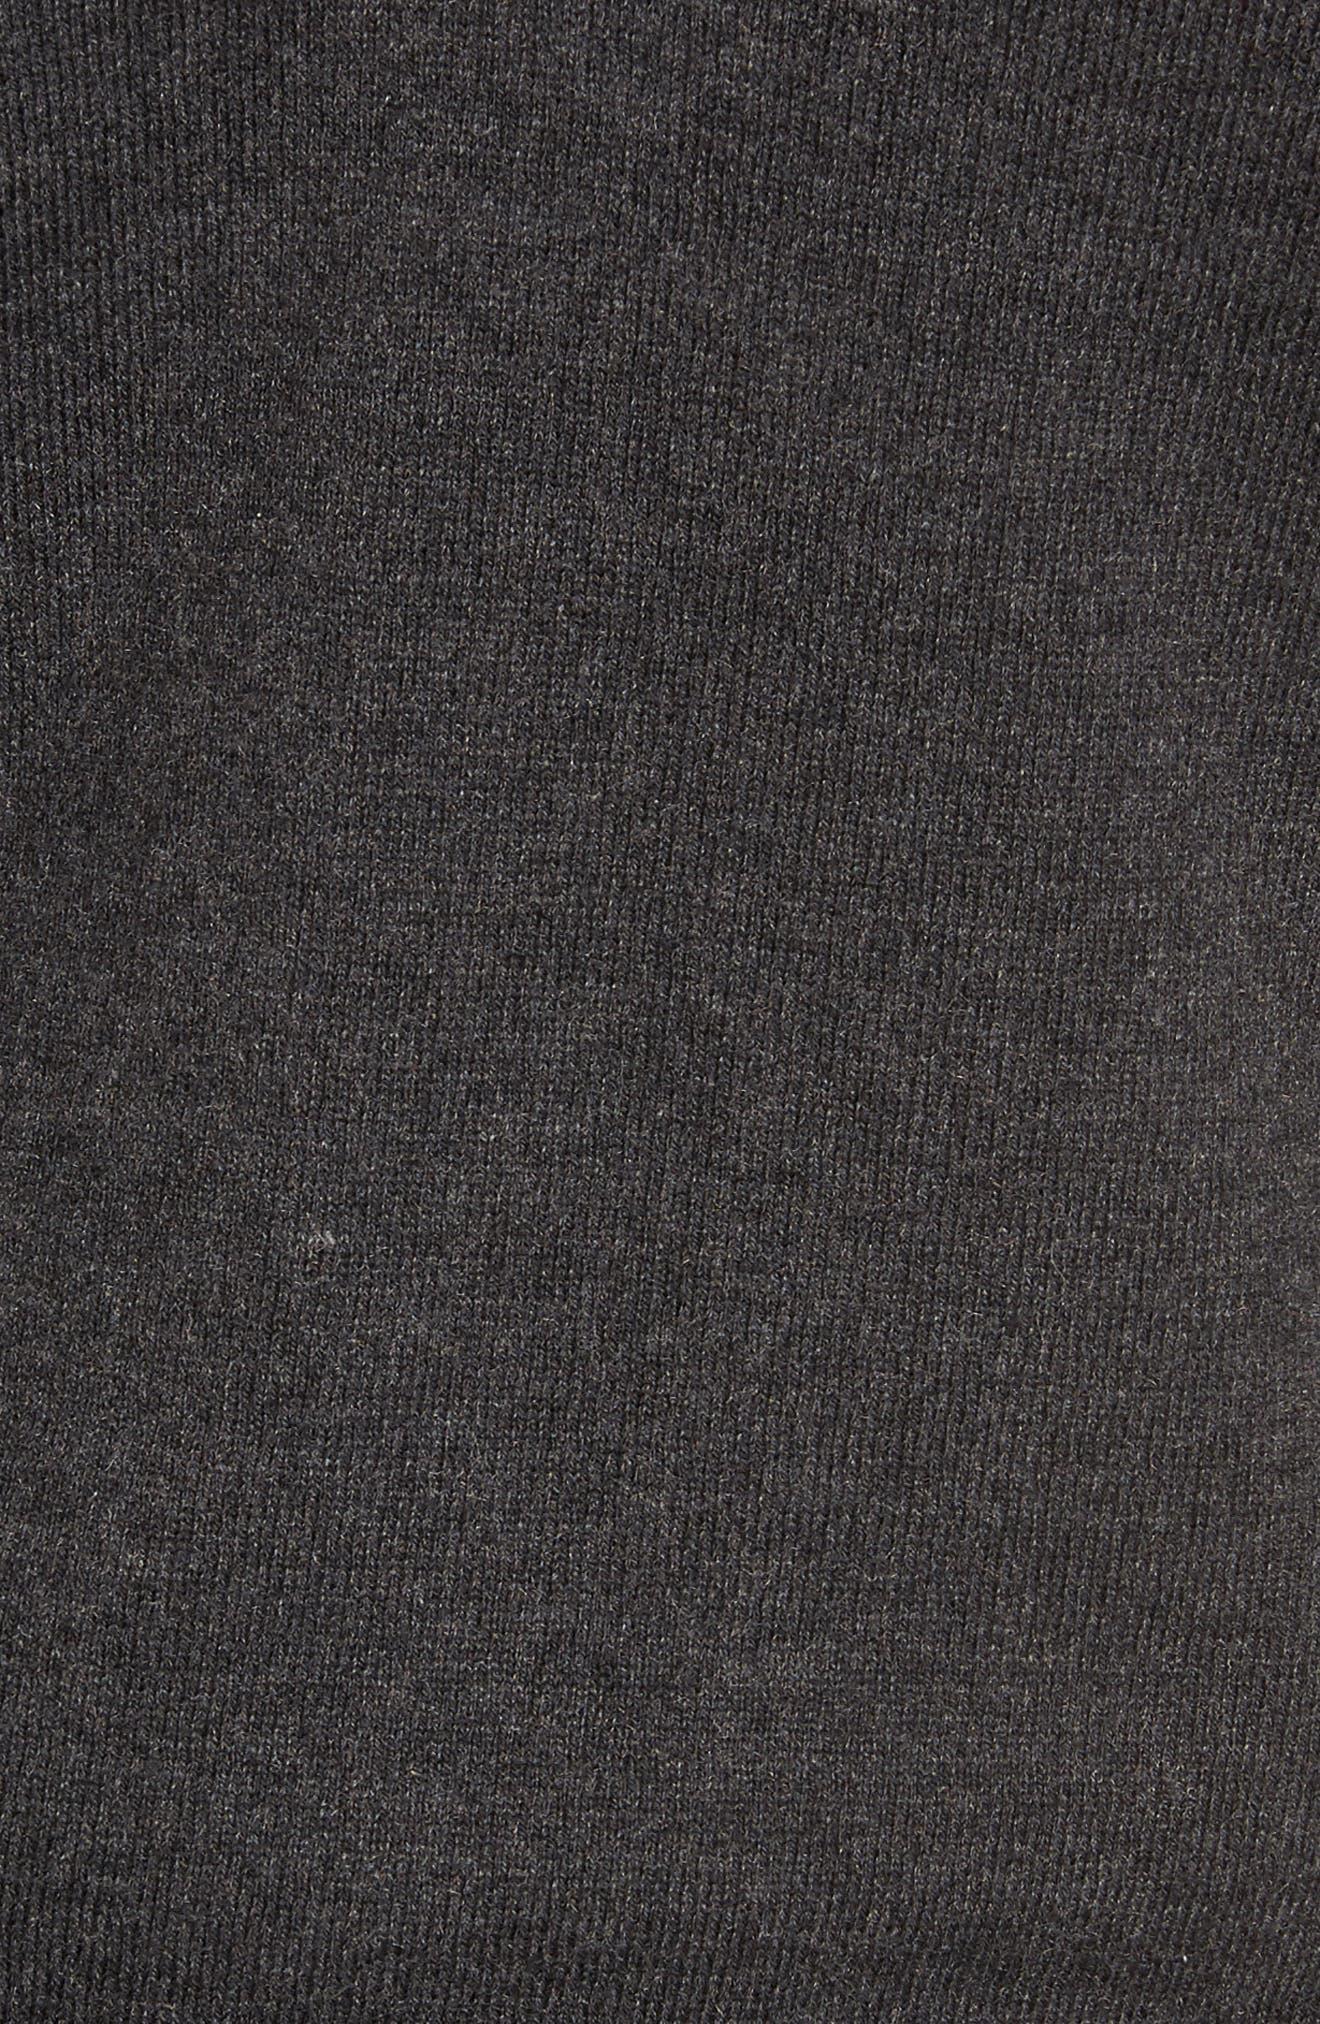 Tie Bell Sleeve Top,                             Alternate thumbnail 5, color,                             020